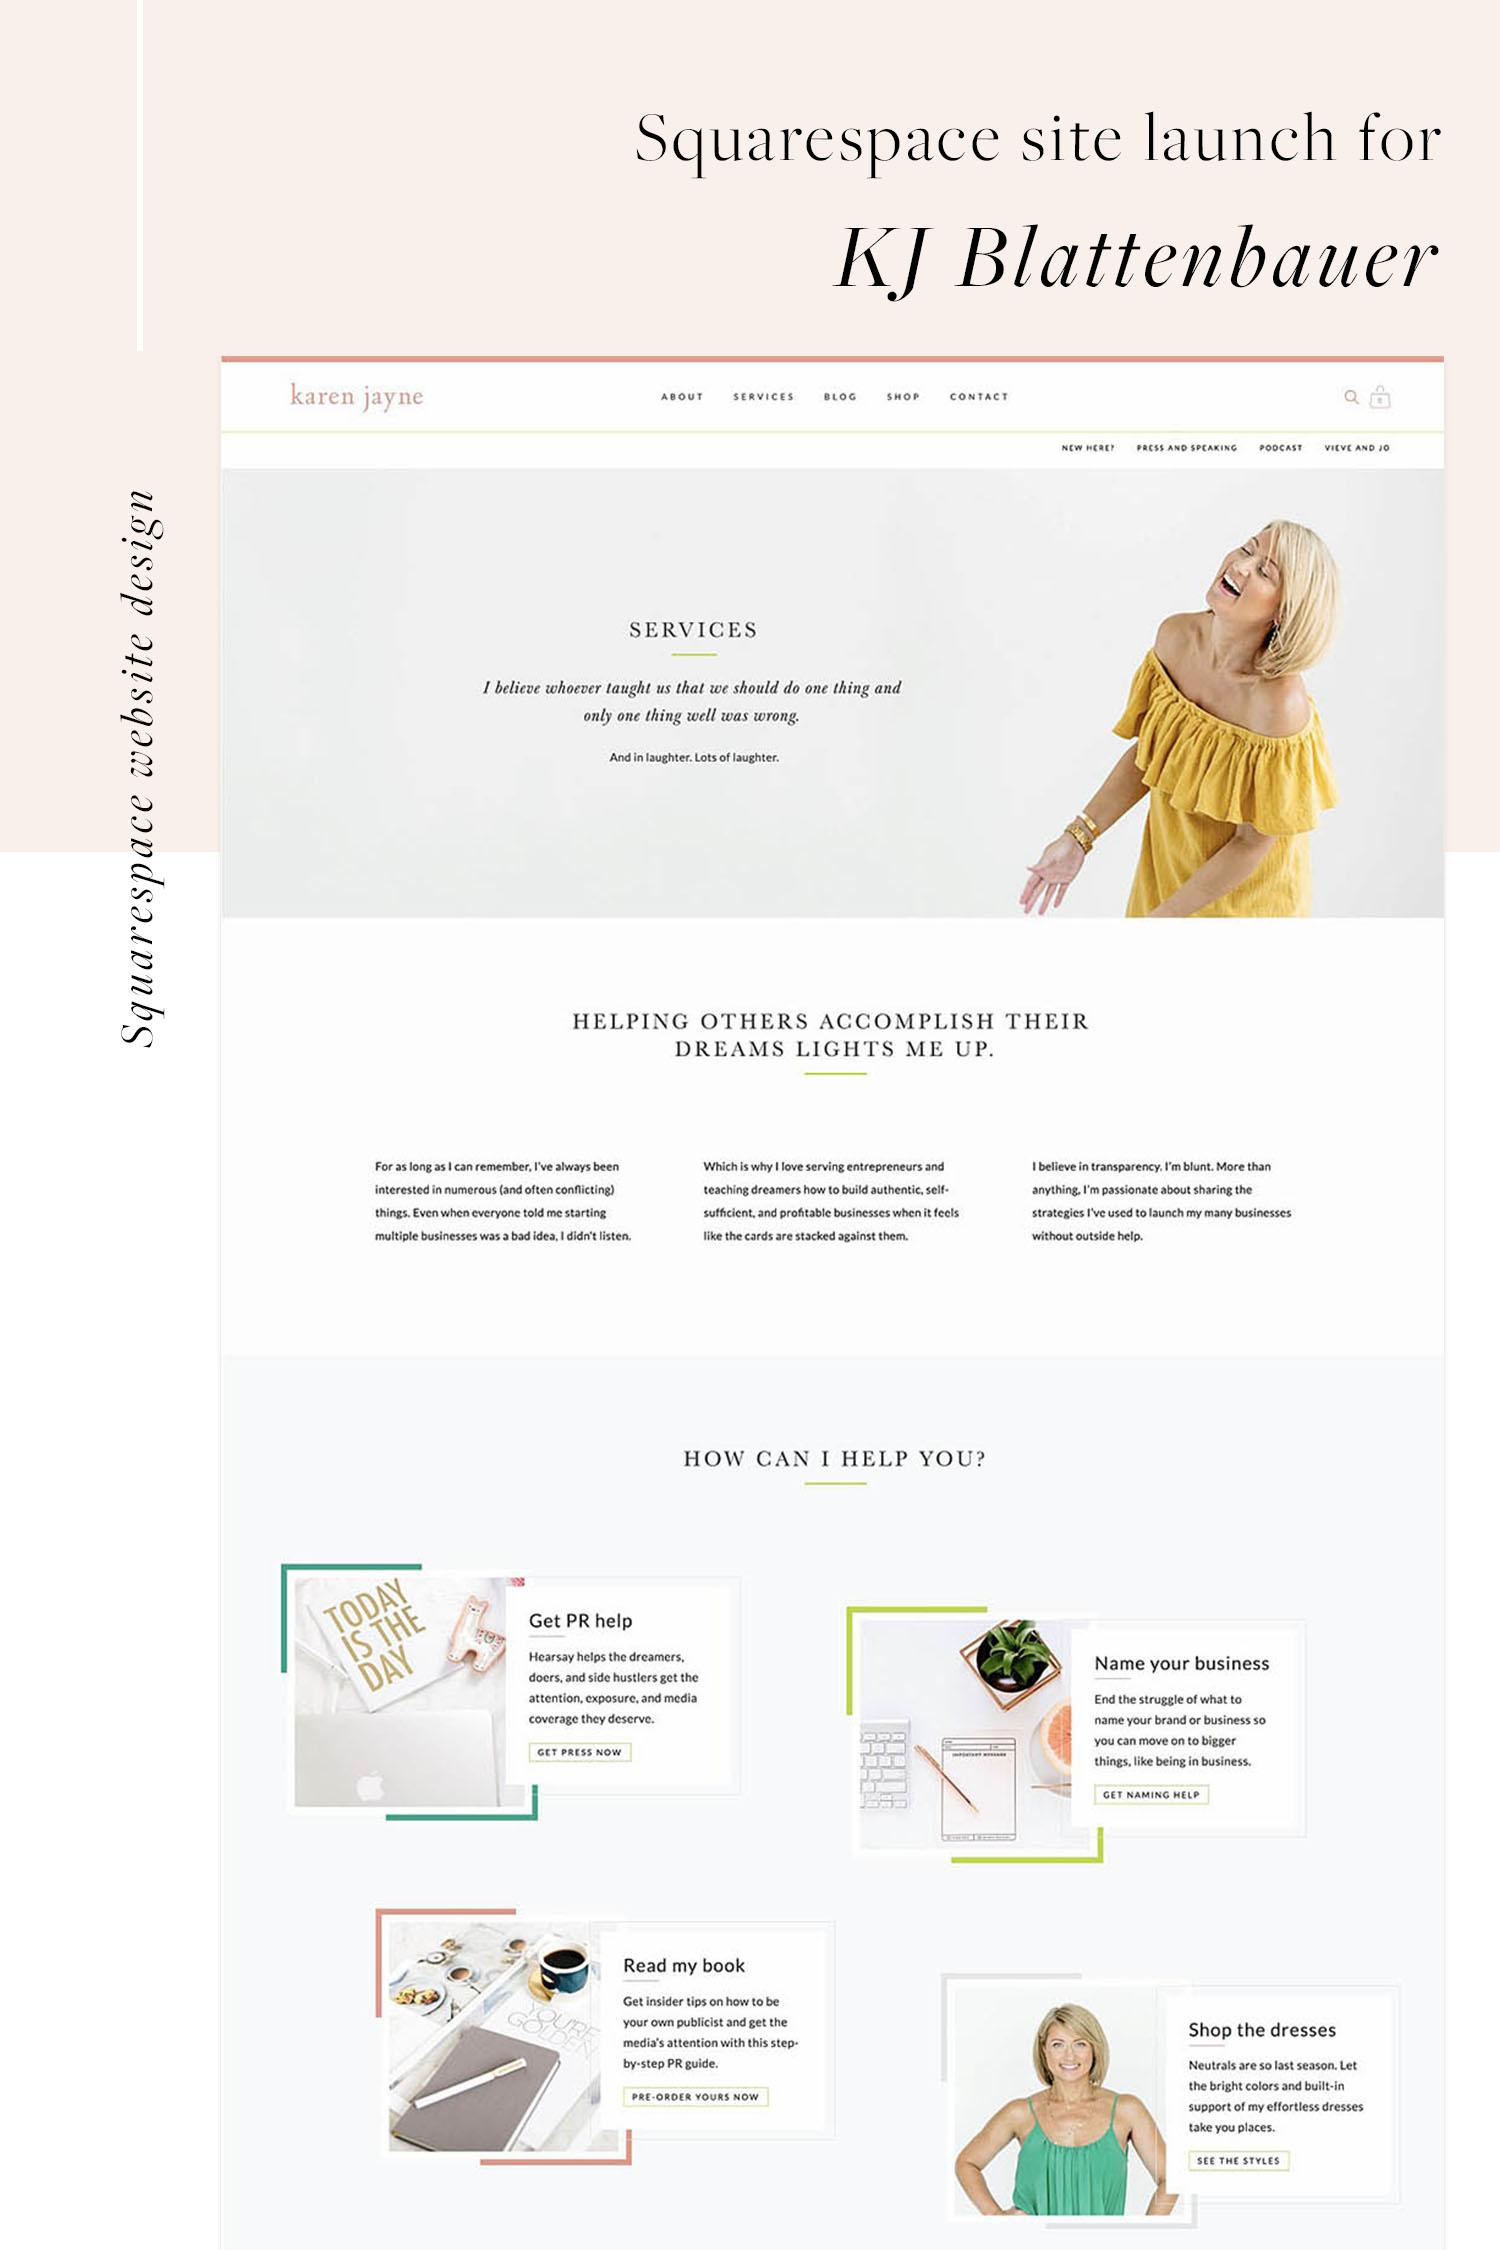 KJ Blattenbauer Services page | Squarespace web design by Jodi Neufeld Design #squarespace #webdesign #minimal #clean